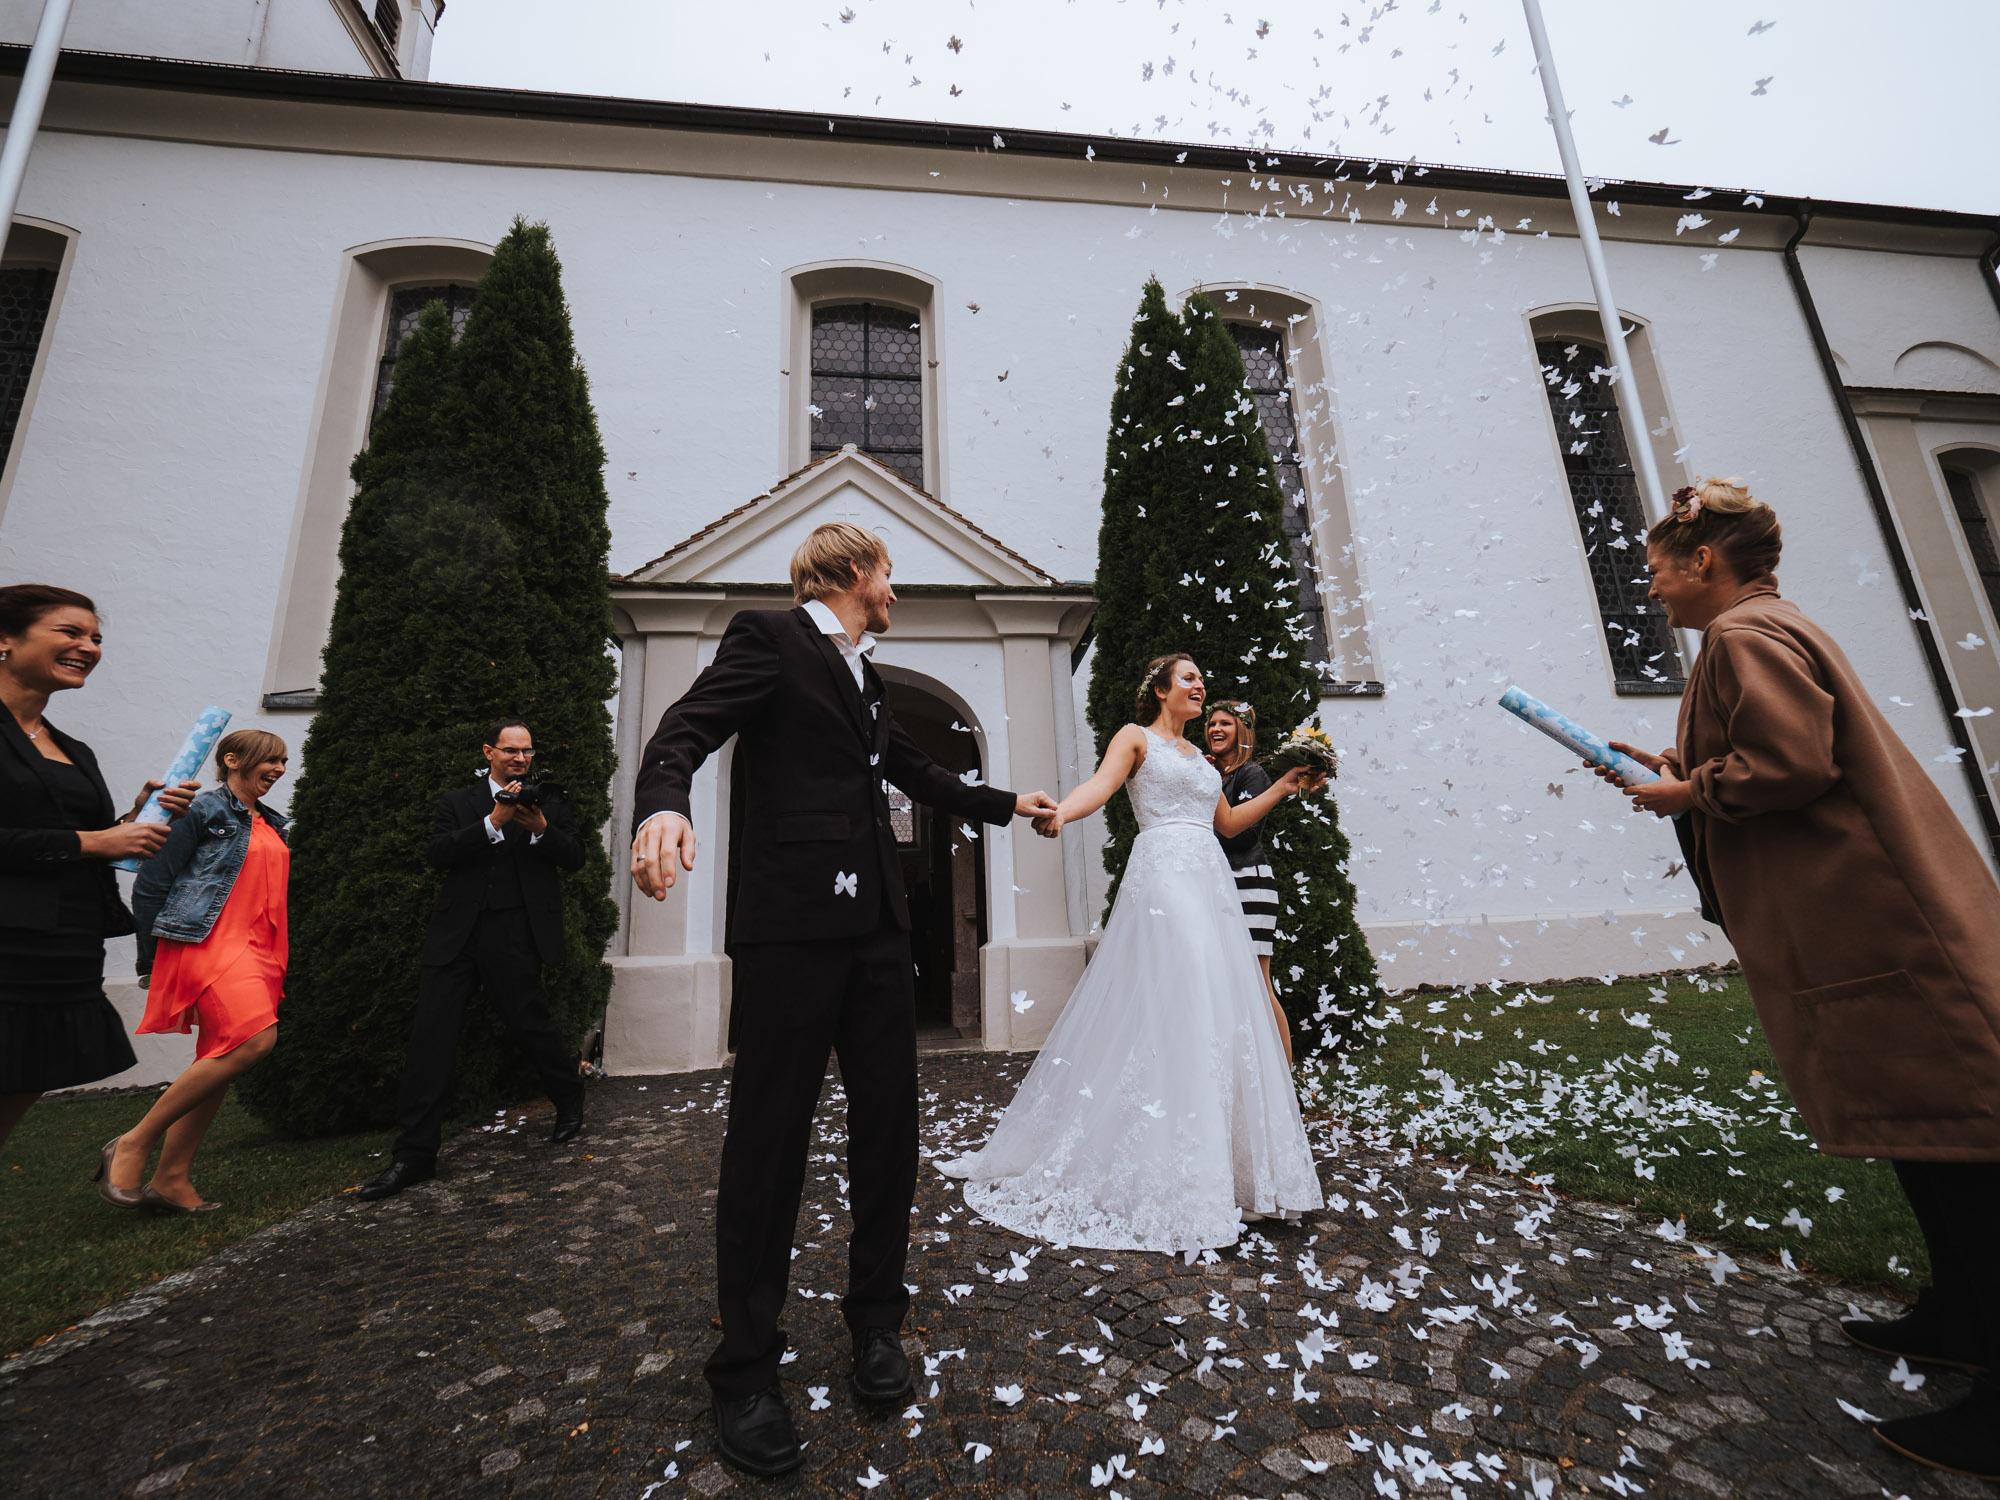 Hochzeit-Memory-factory-20170909-0012.jpg